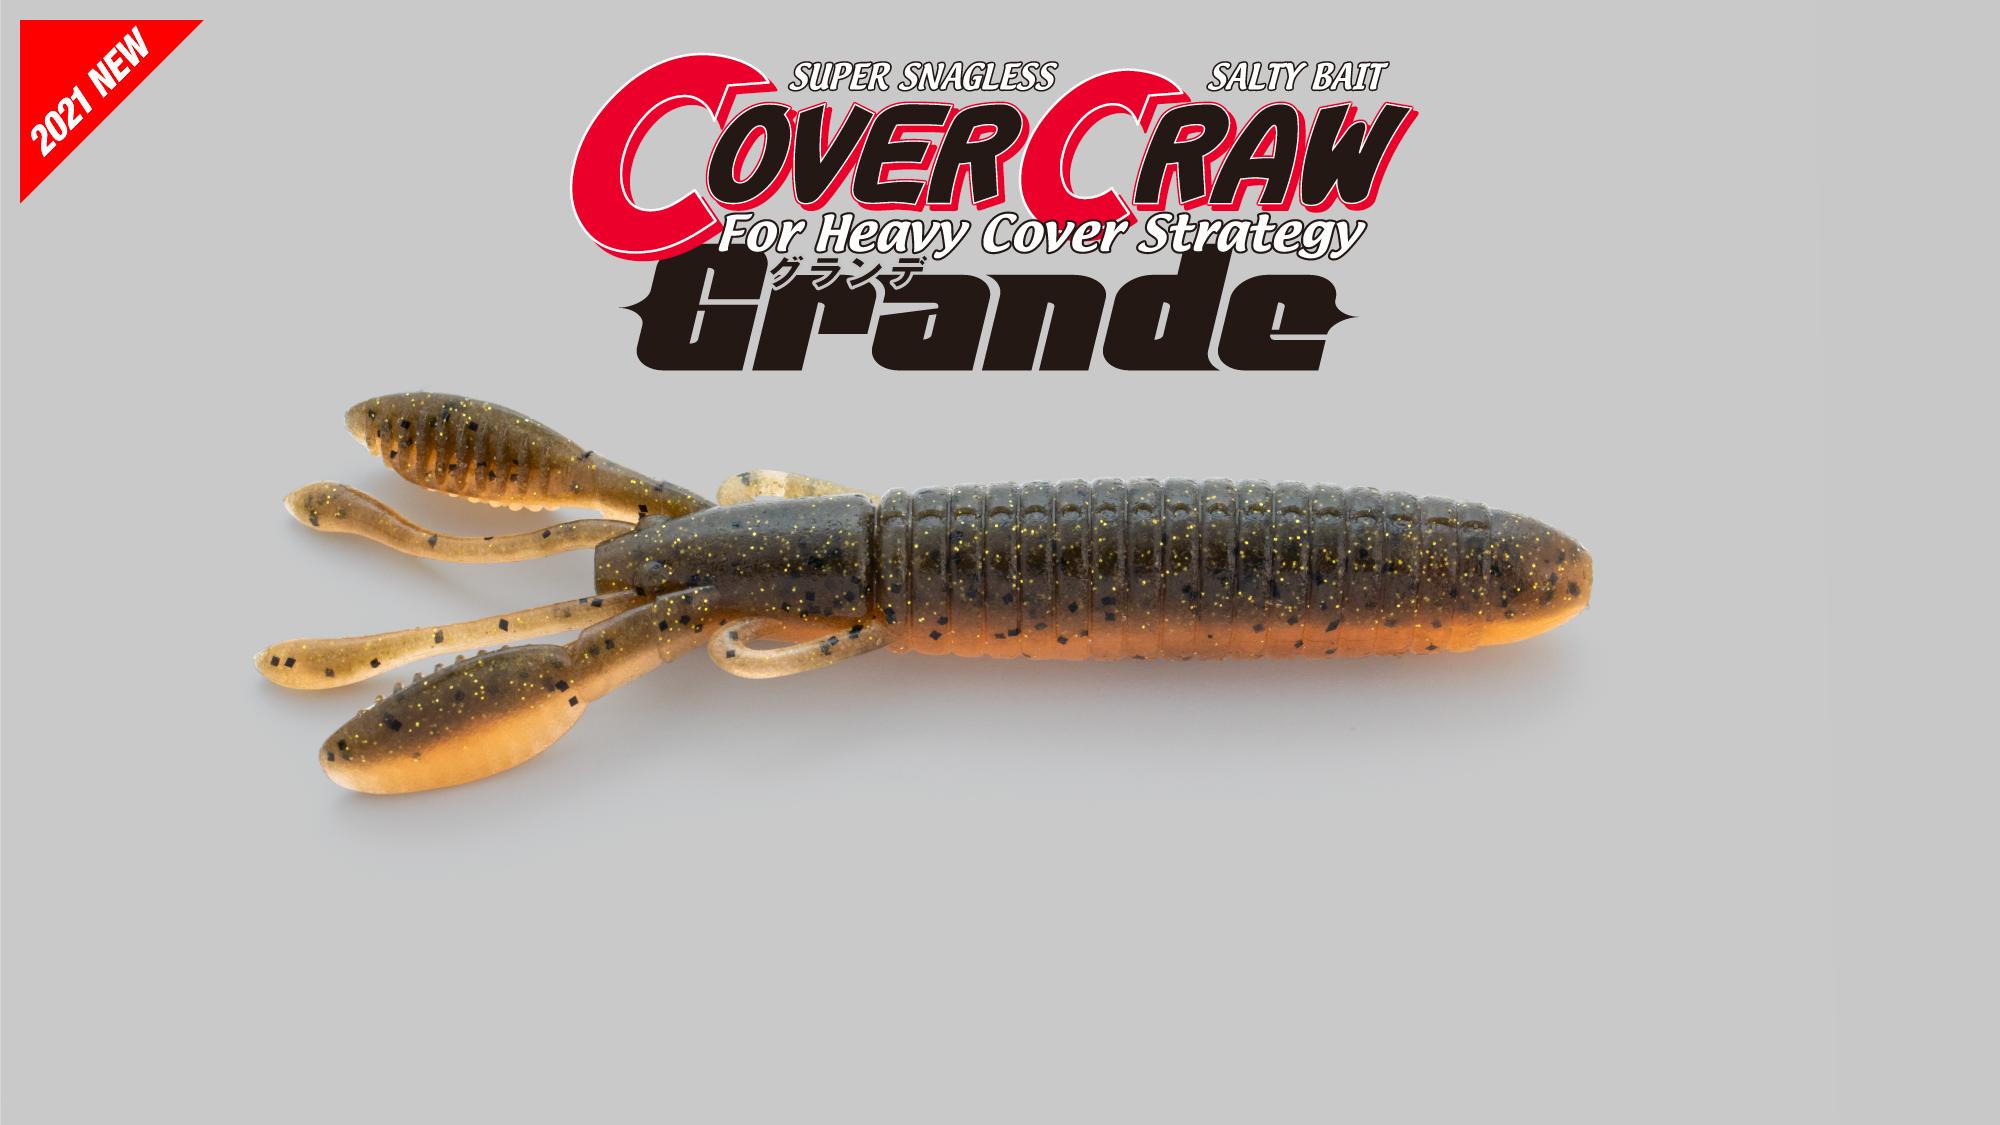 covercraw_grande_pc_TOP